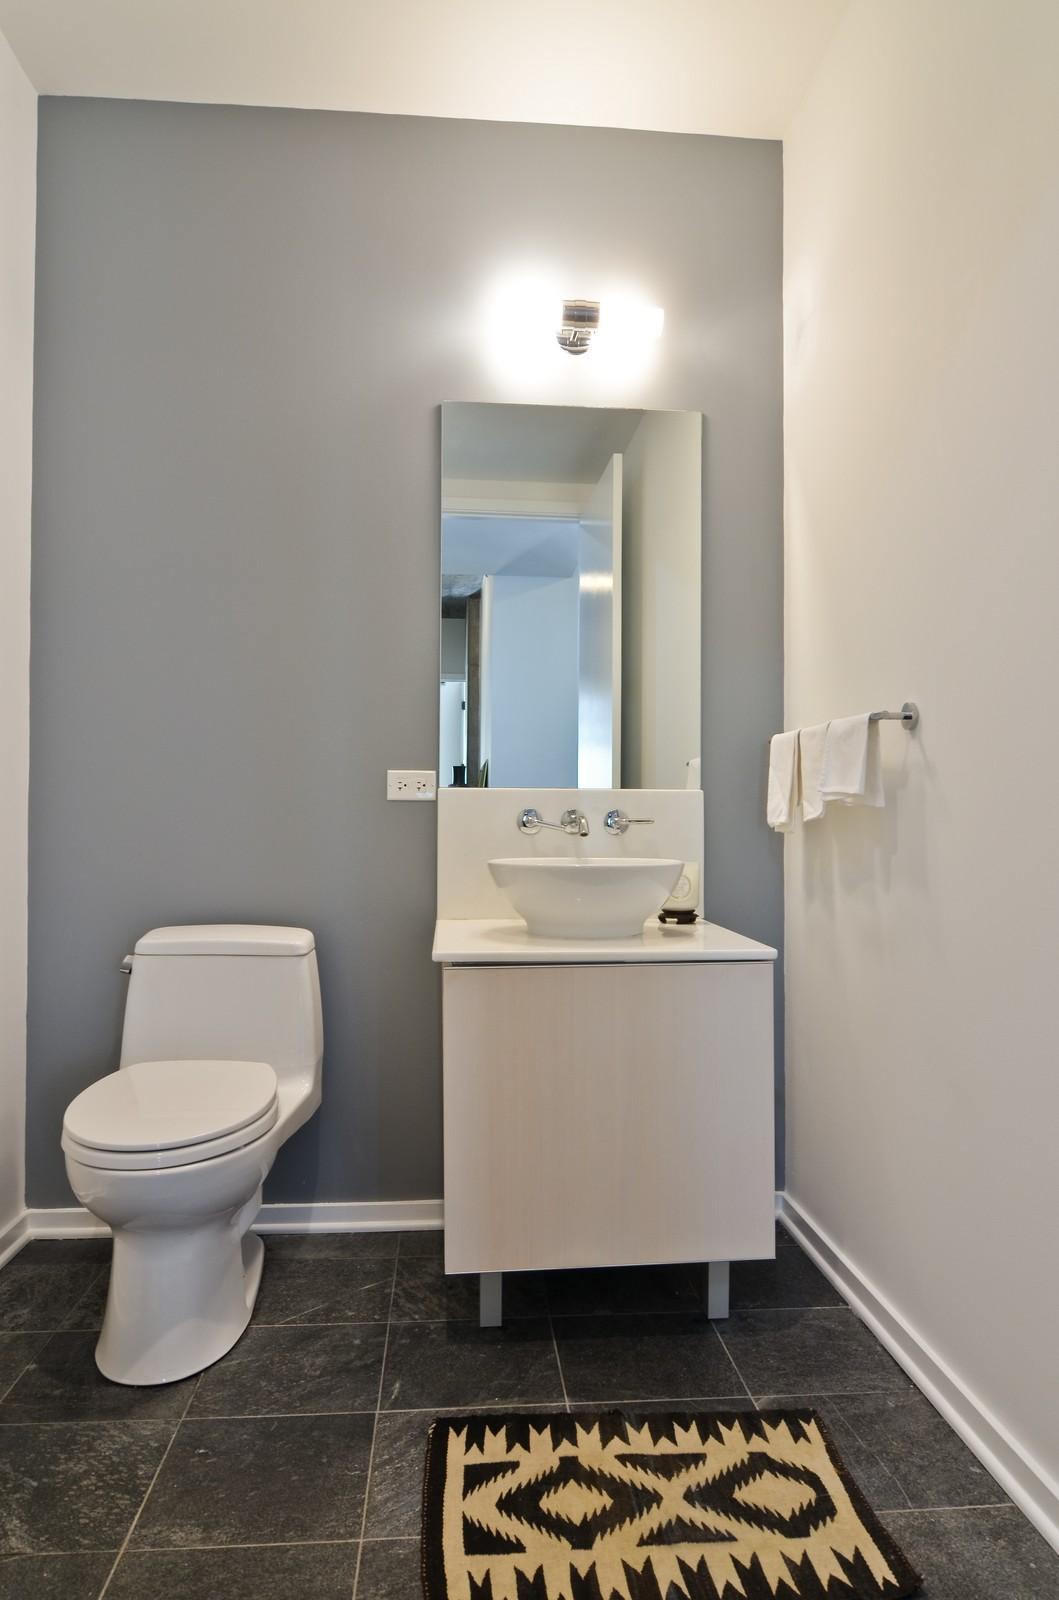 Real Estate Photography - 600 N Fairbanks, Unit 1801, Chicago, IL, 60611 - Half Bath